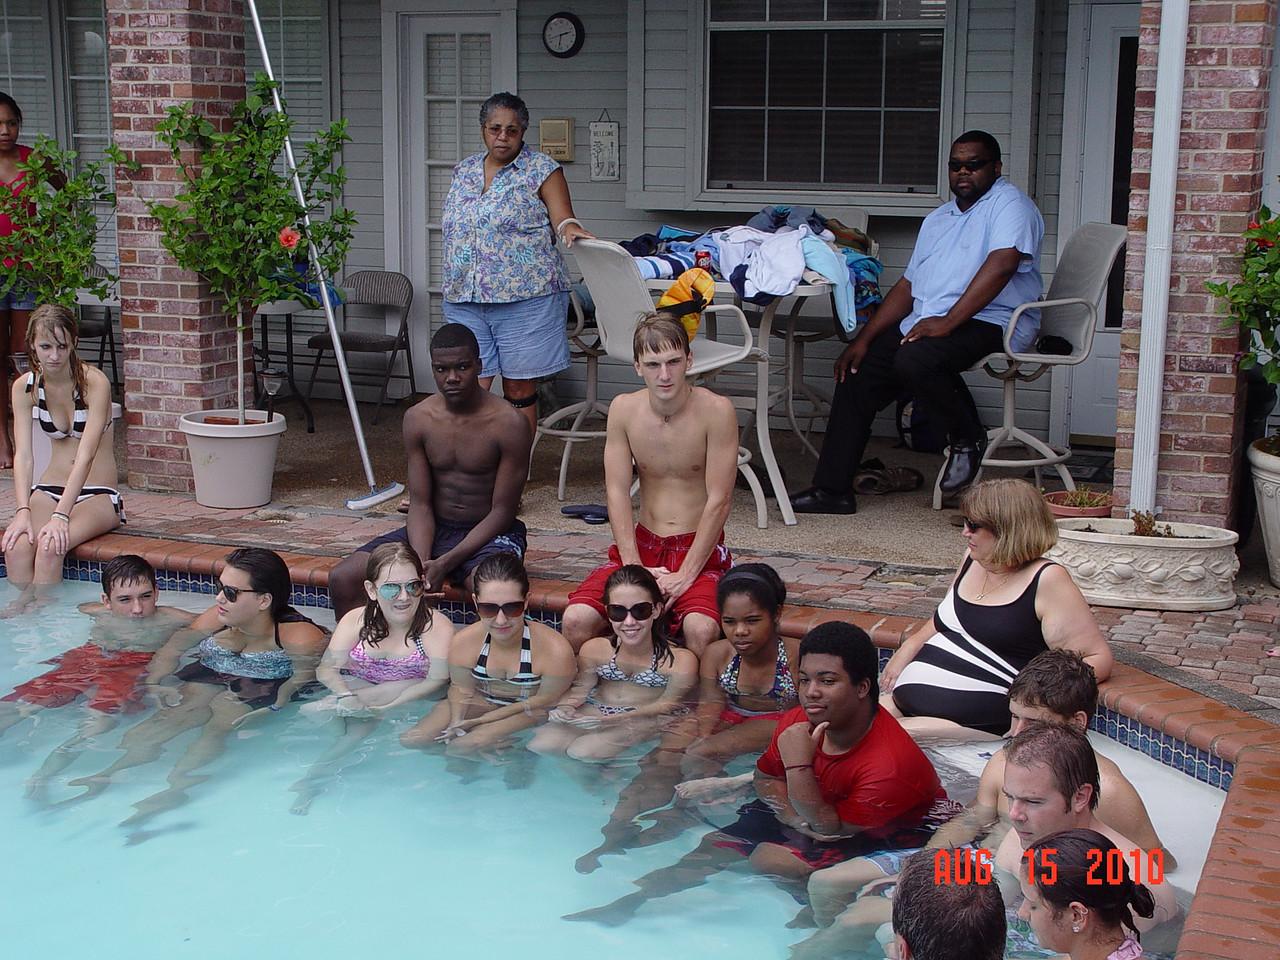 2010-08-15D-group-baptisim 040group